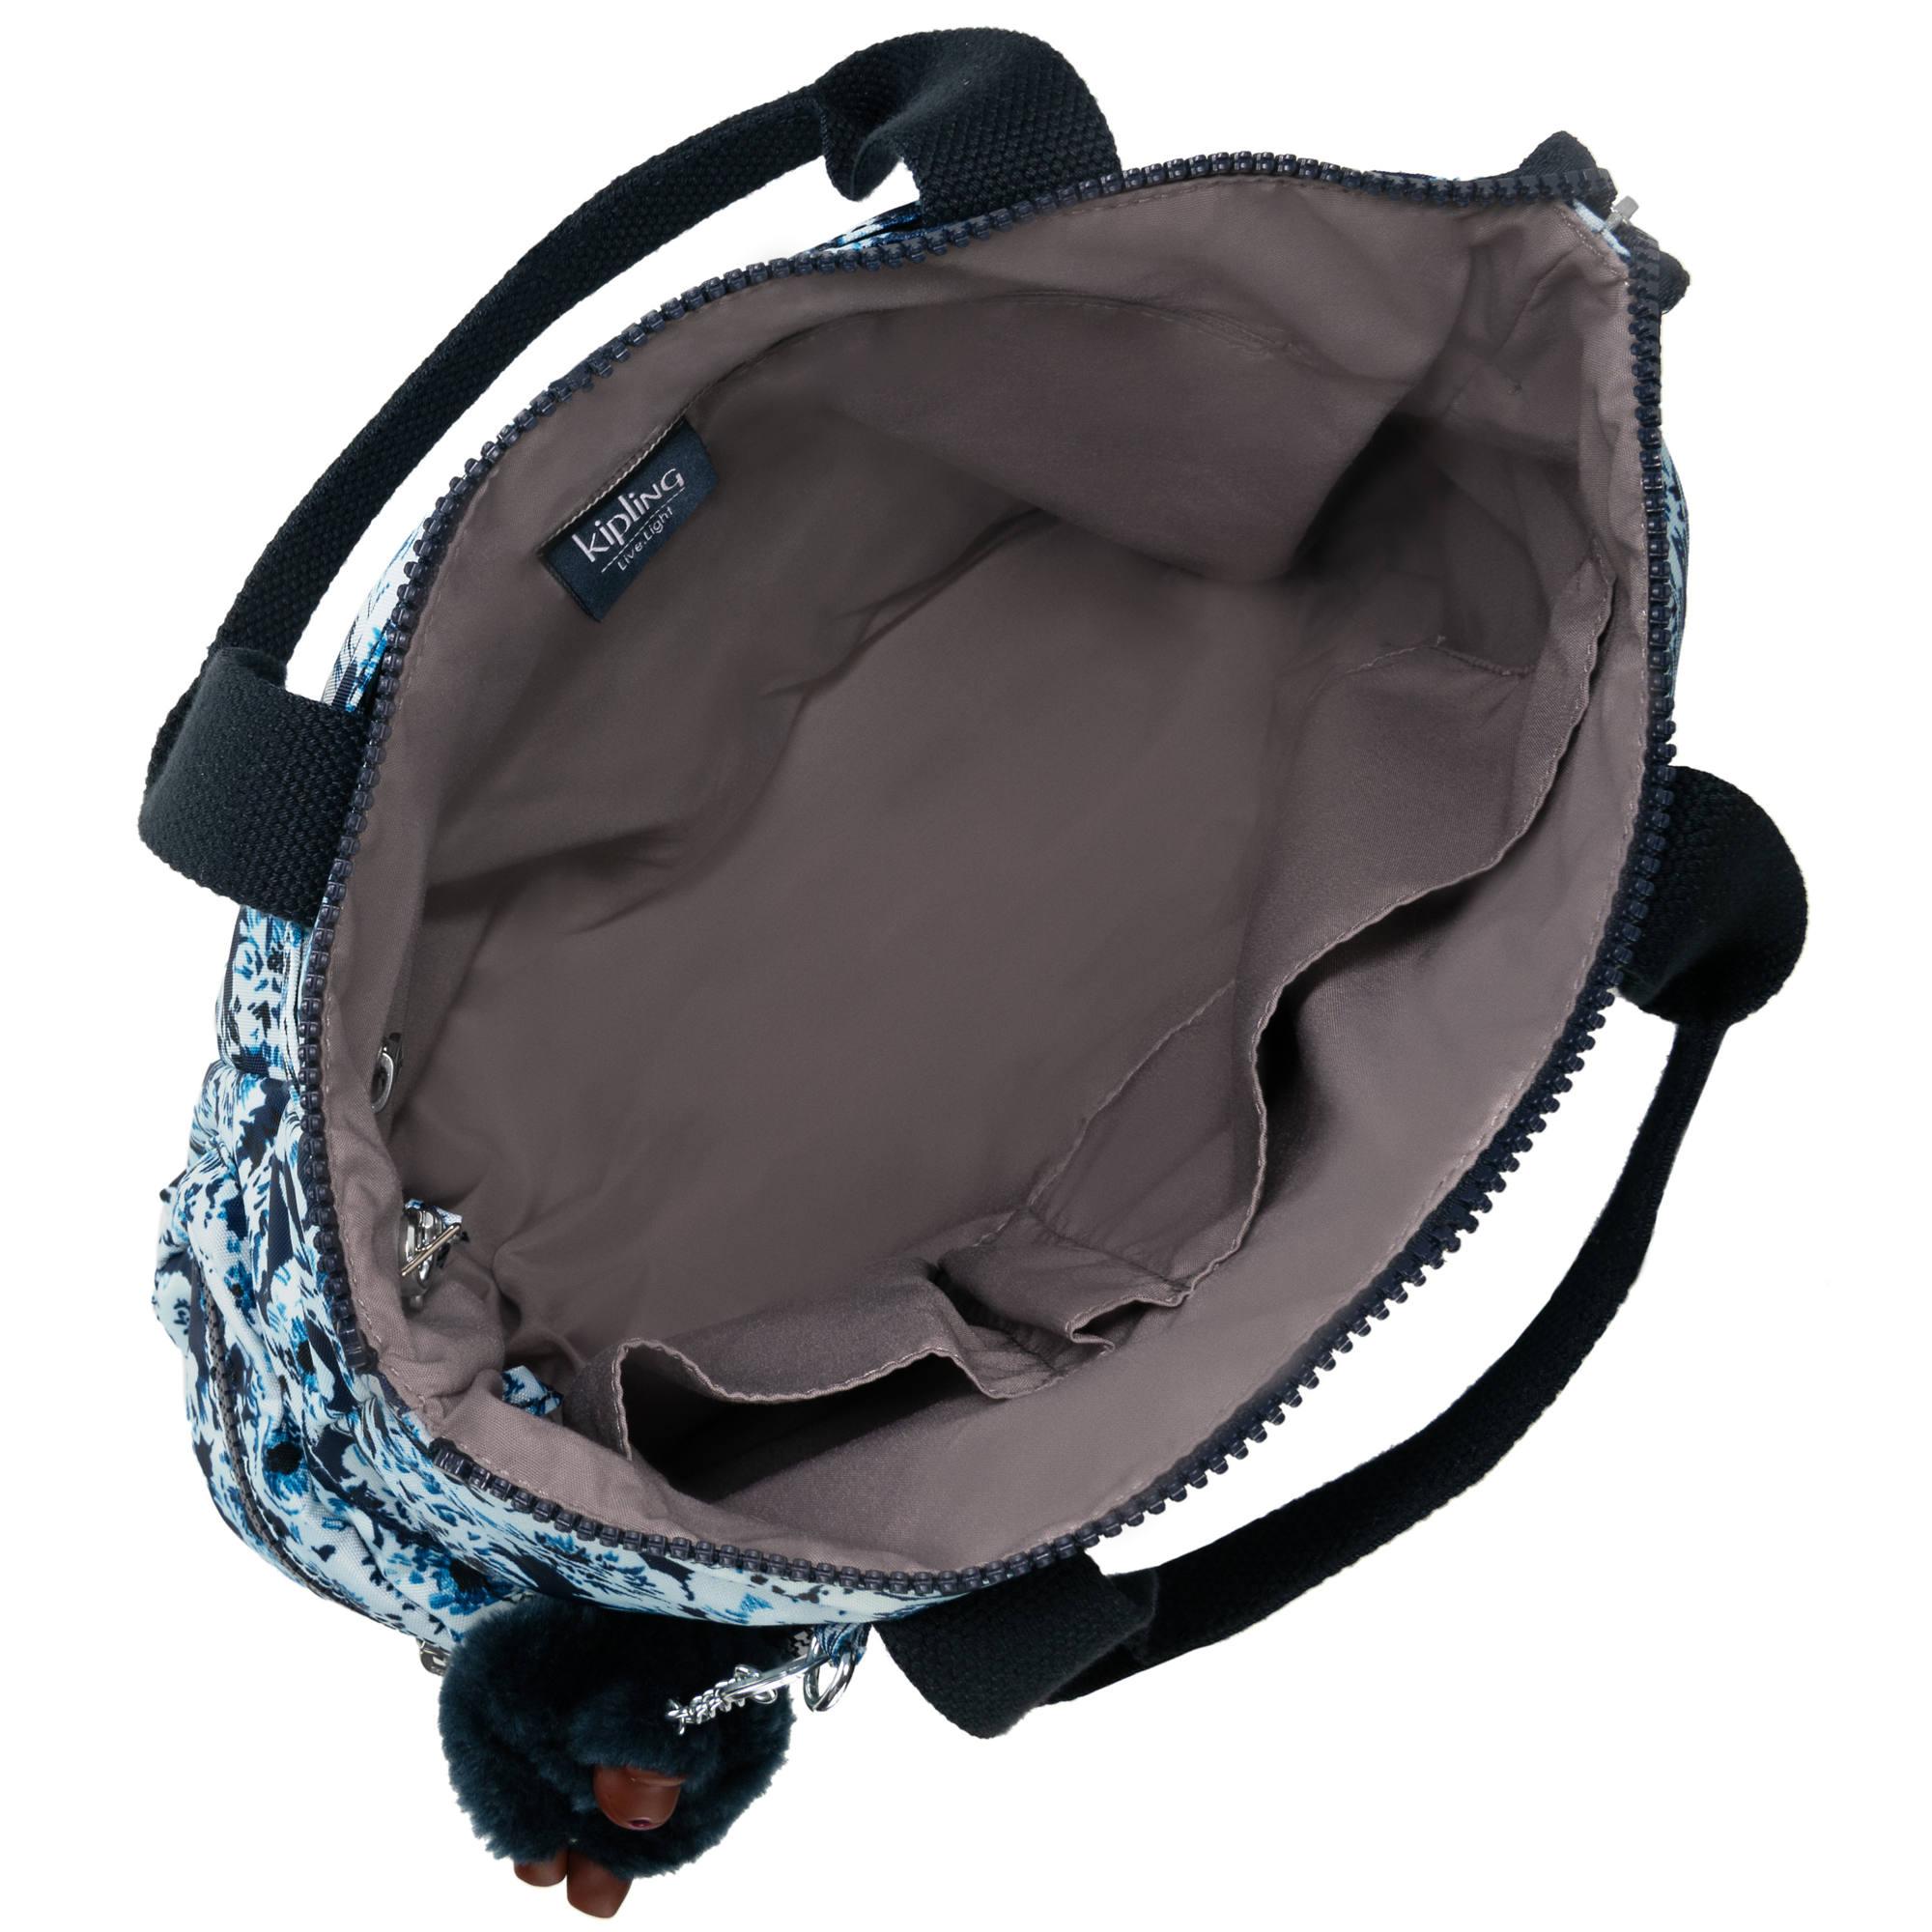 Kipling-Alvy-2-In-1-Convertible-Tote-Bag-Backpack miniatura 33